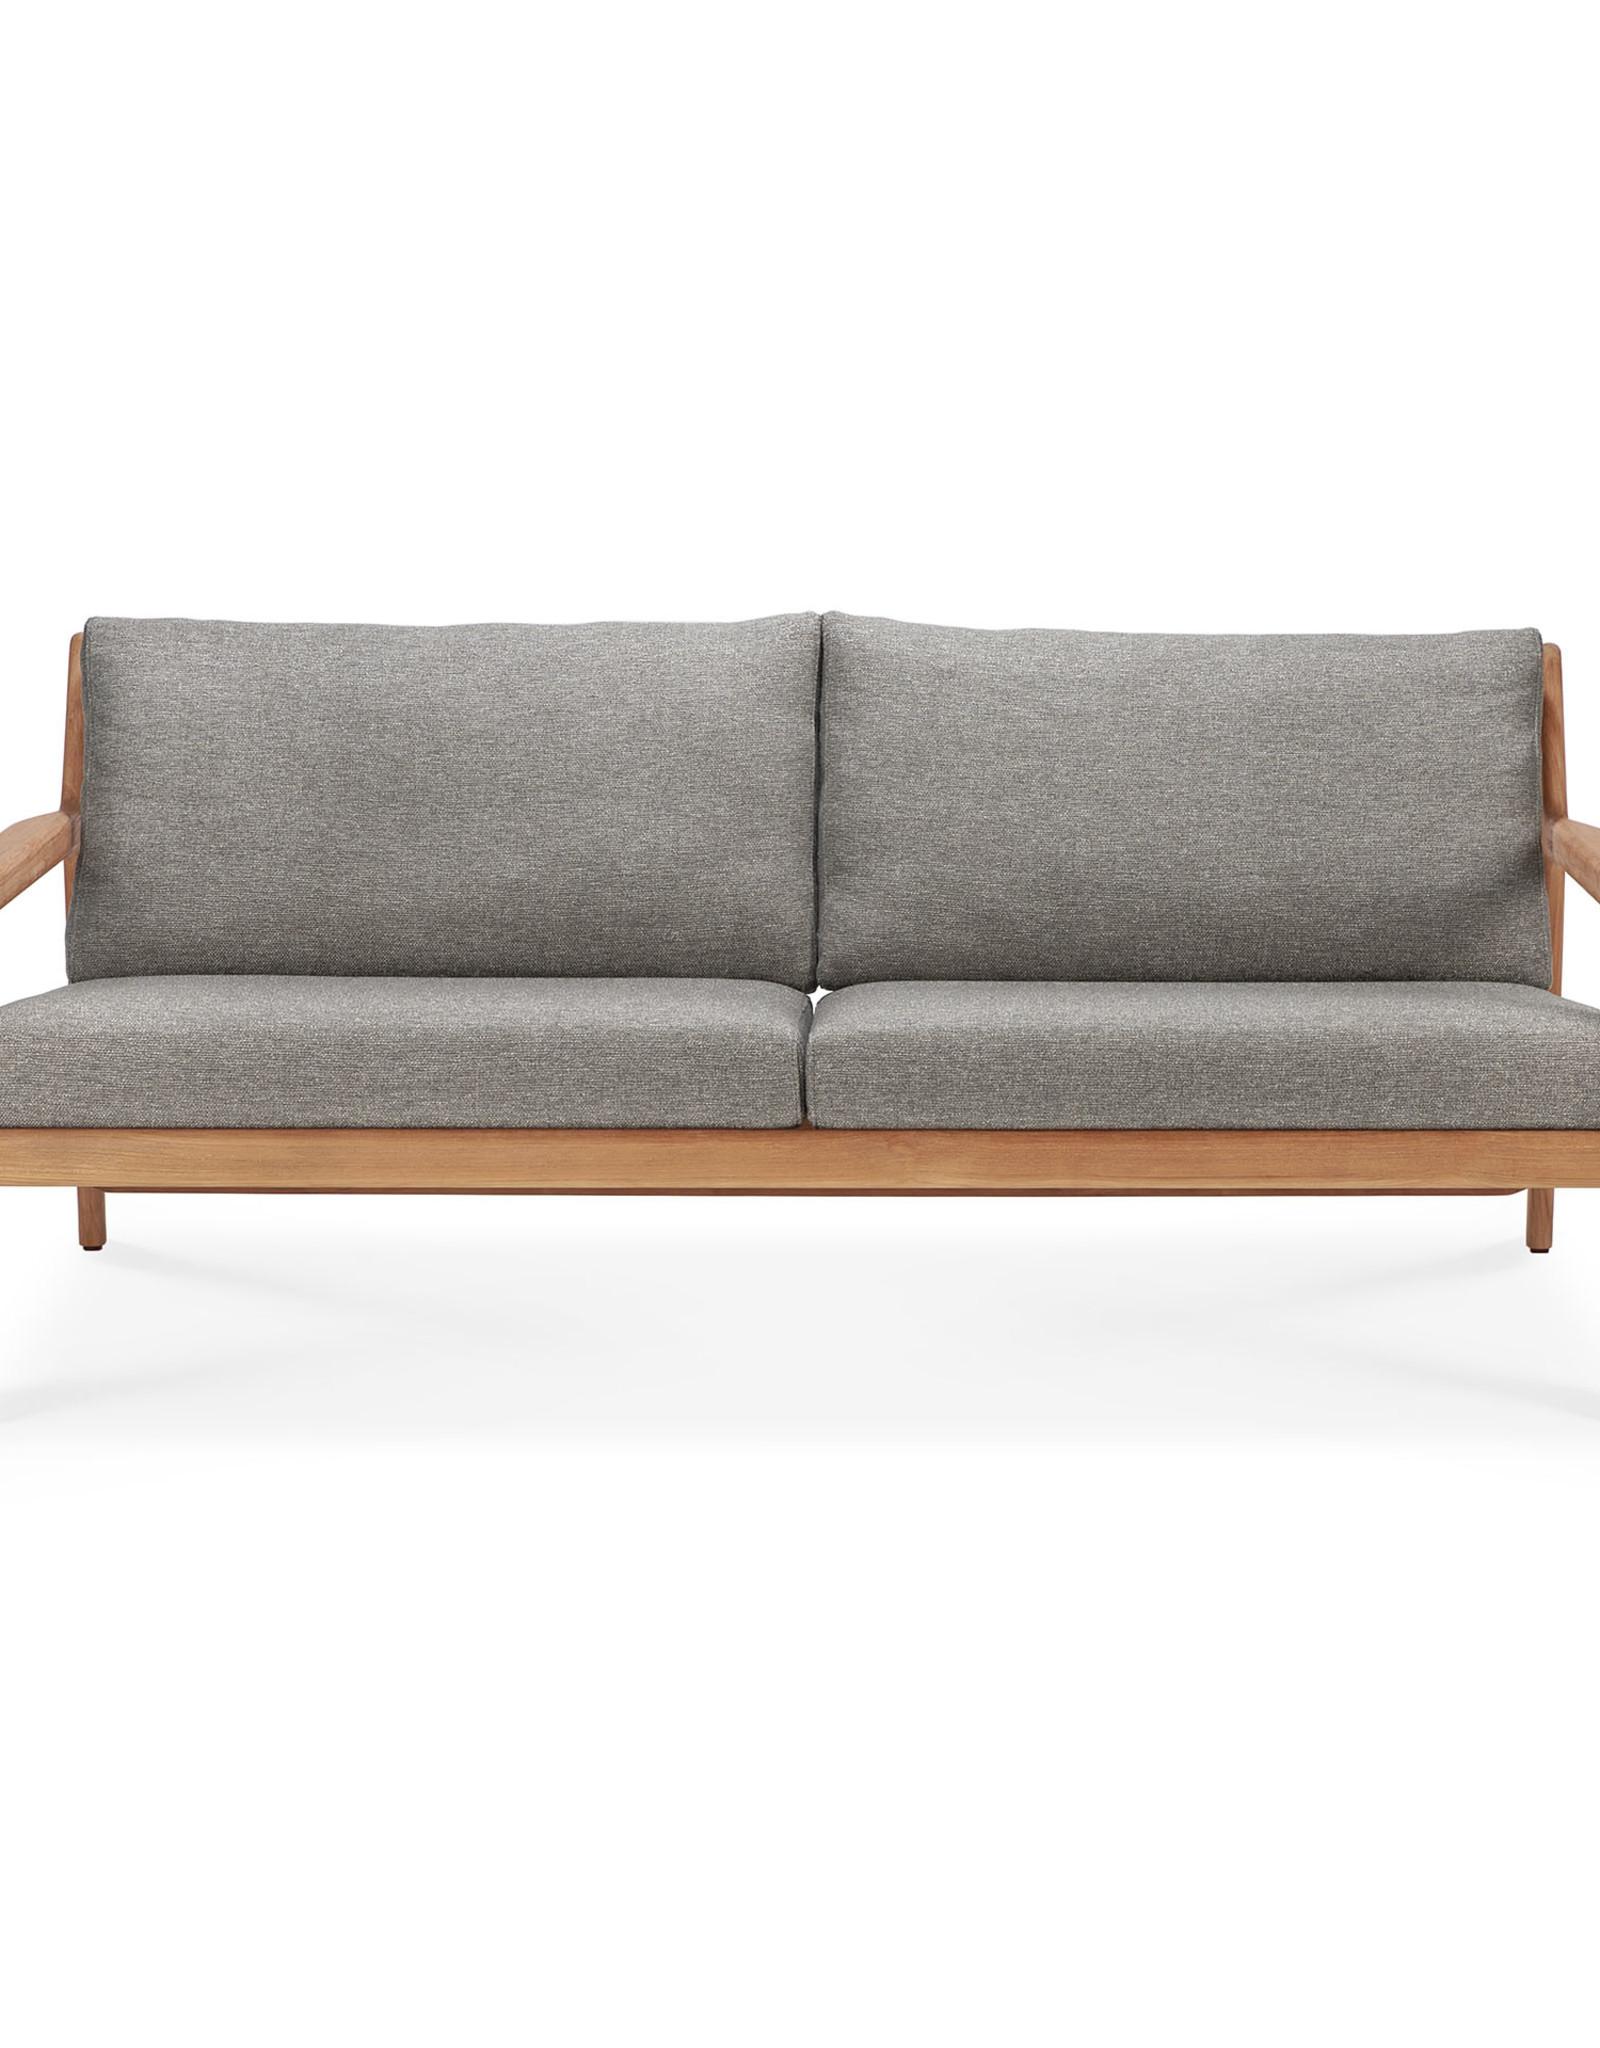 Teak Jack outdoor sofa - mocha, 71 x 35 x 29